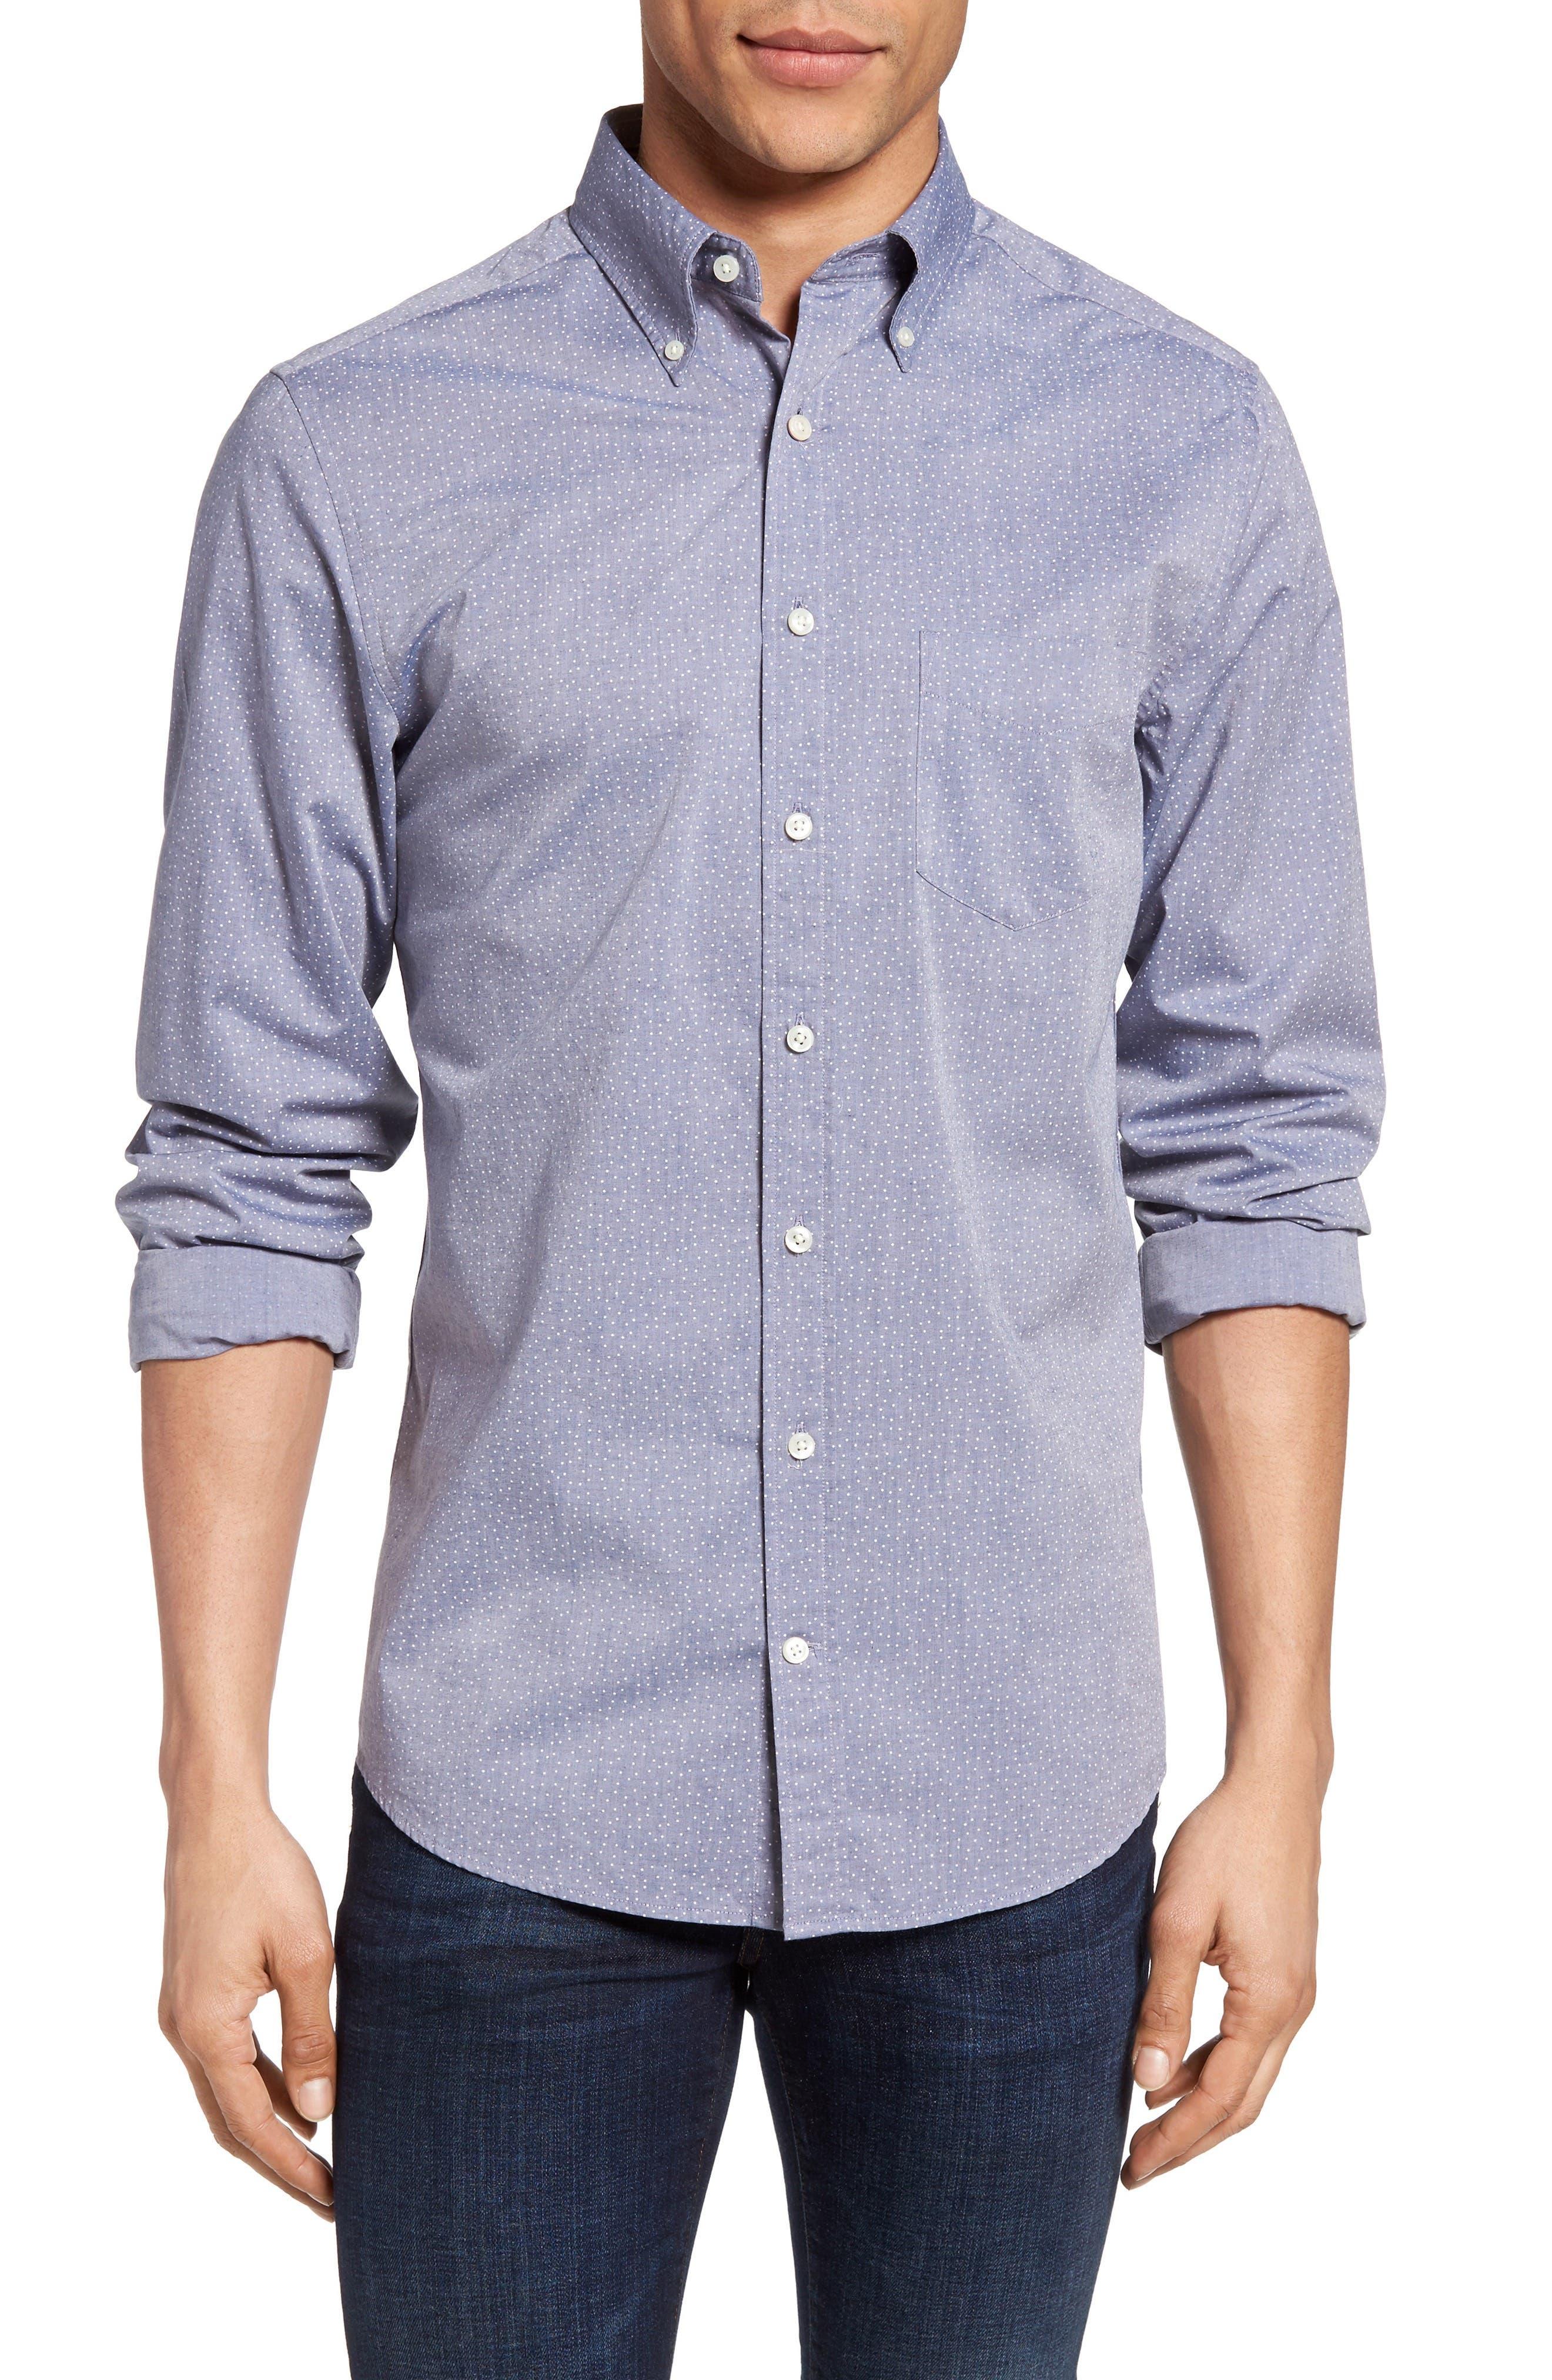 Gant Dot Print Sport Shirt